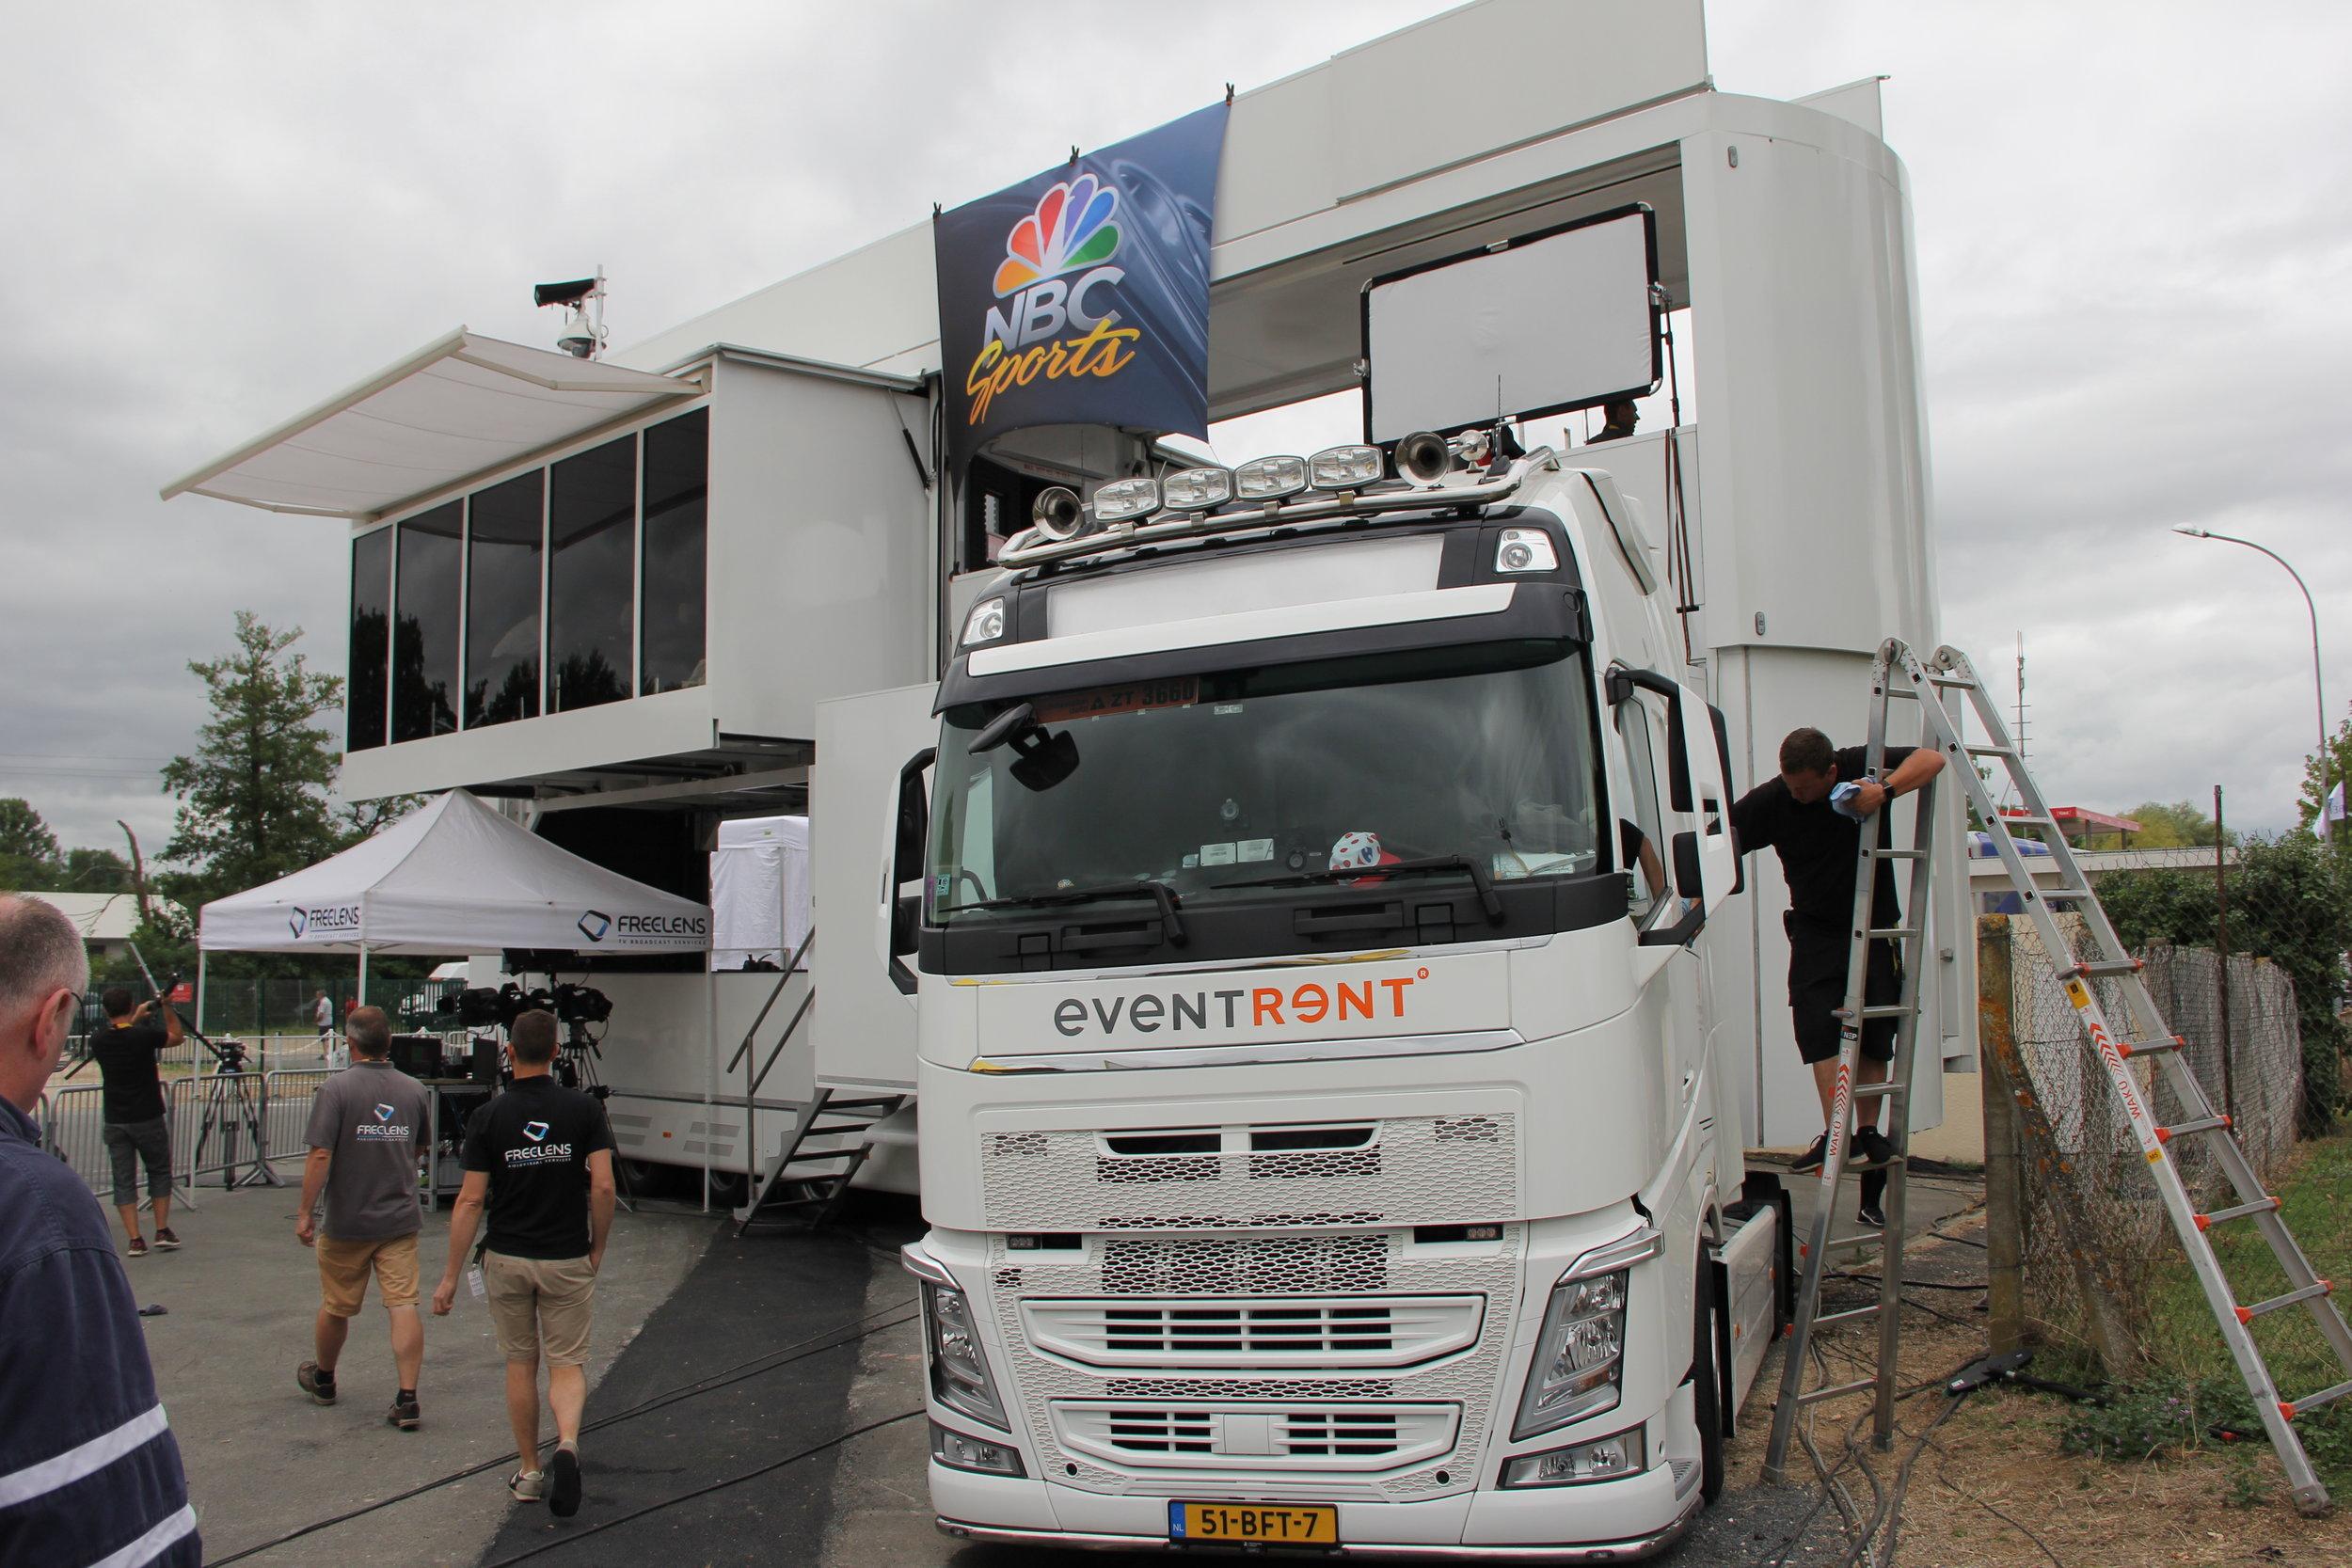 The NBC monster truck/studio